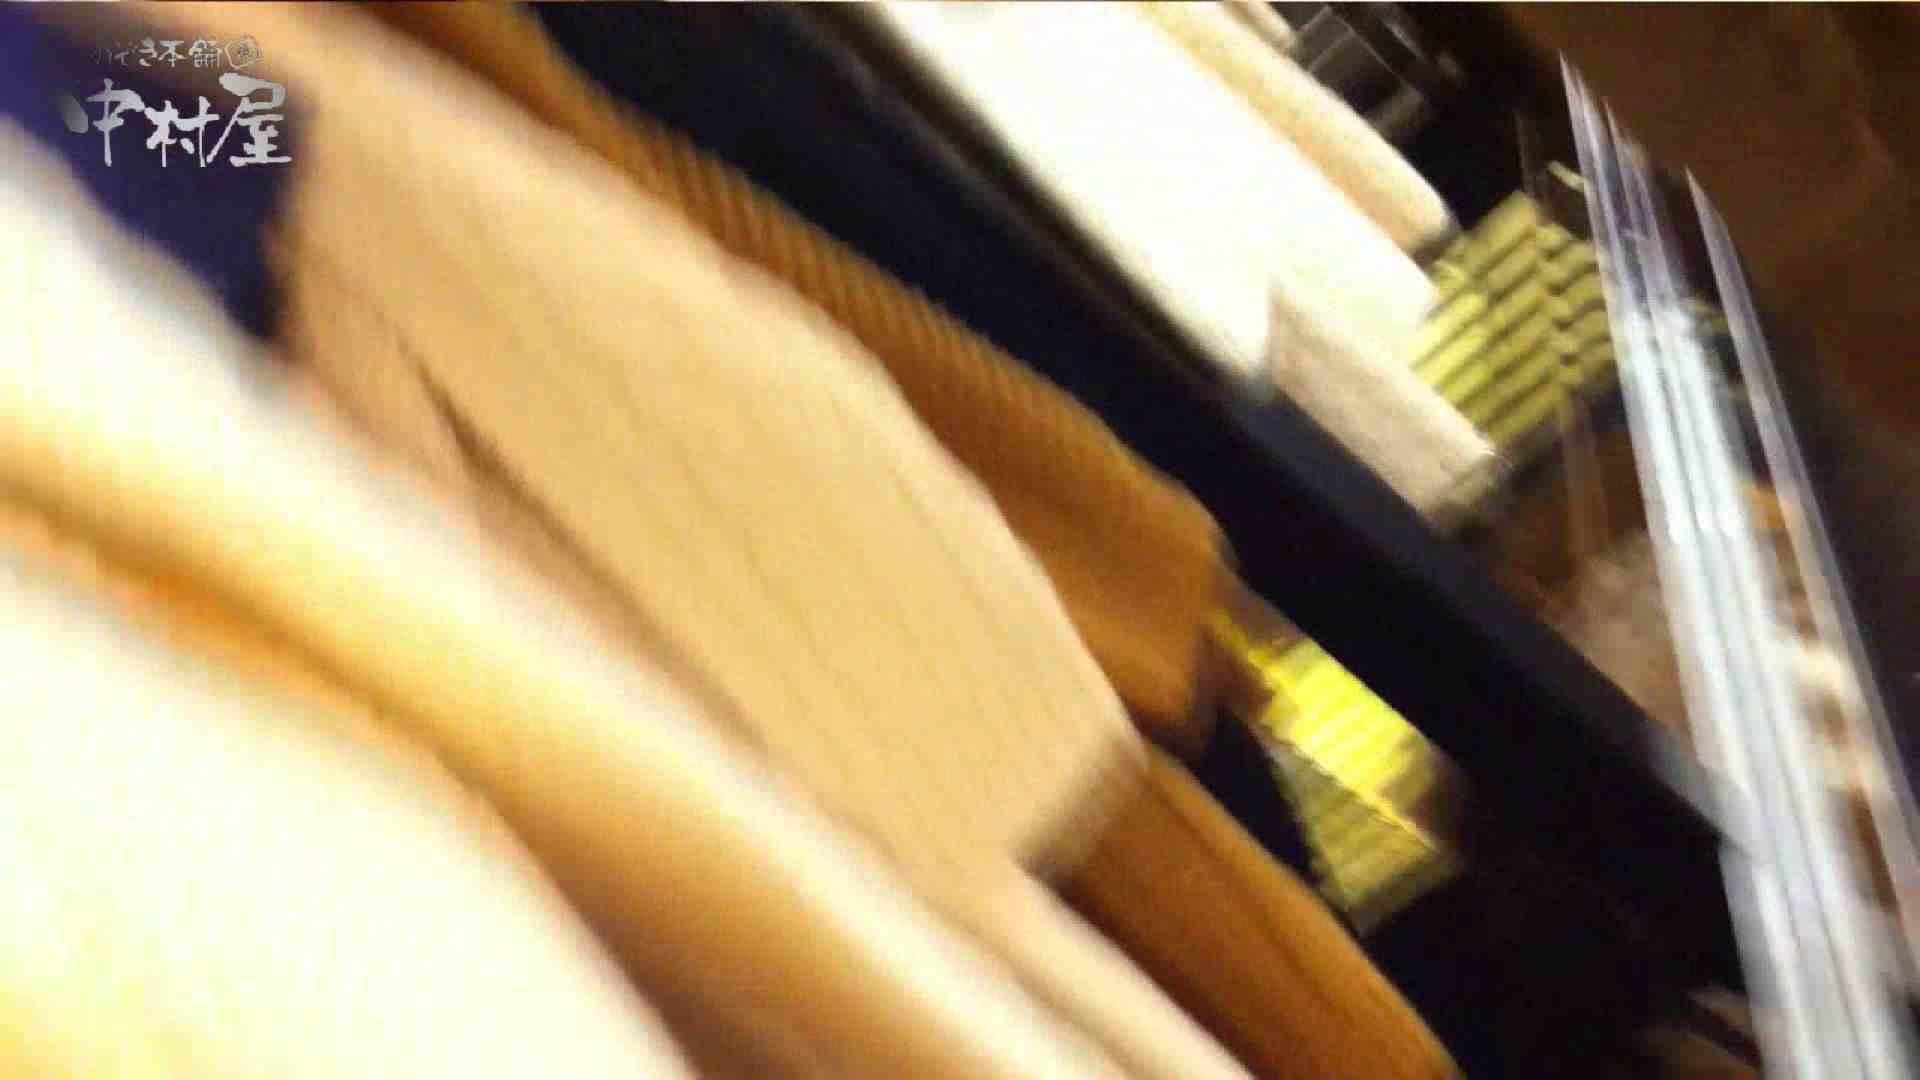 vol.71 美人アパレル胸チラ&パンチラ クイコミパンツでお買い物 接写 AV動画キャプチャ 82pic 18